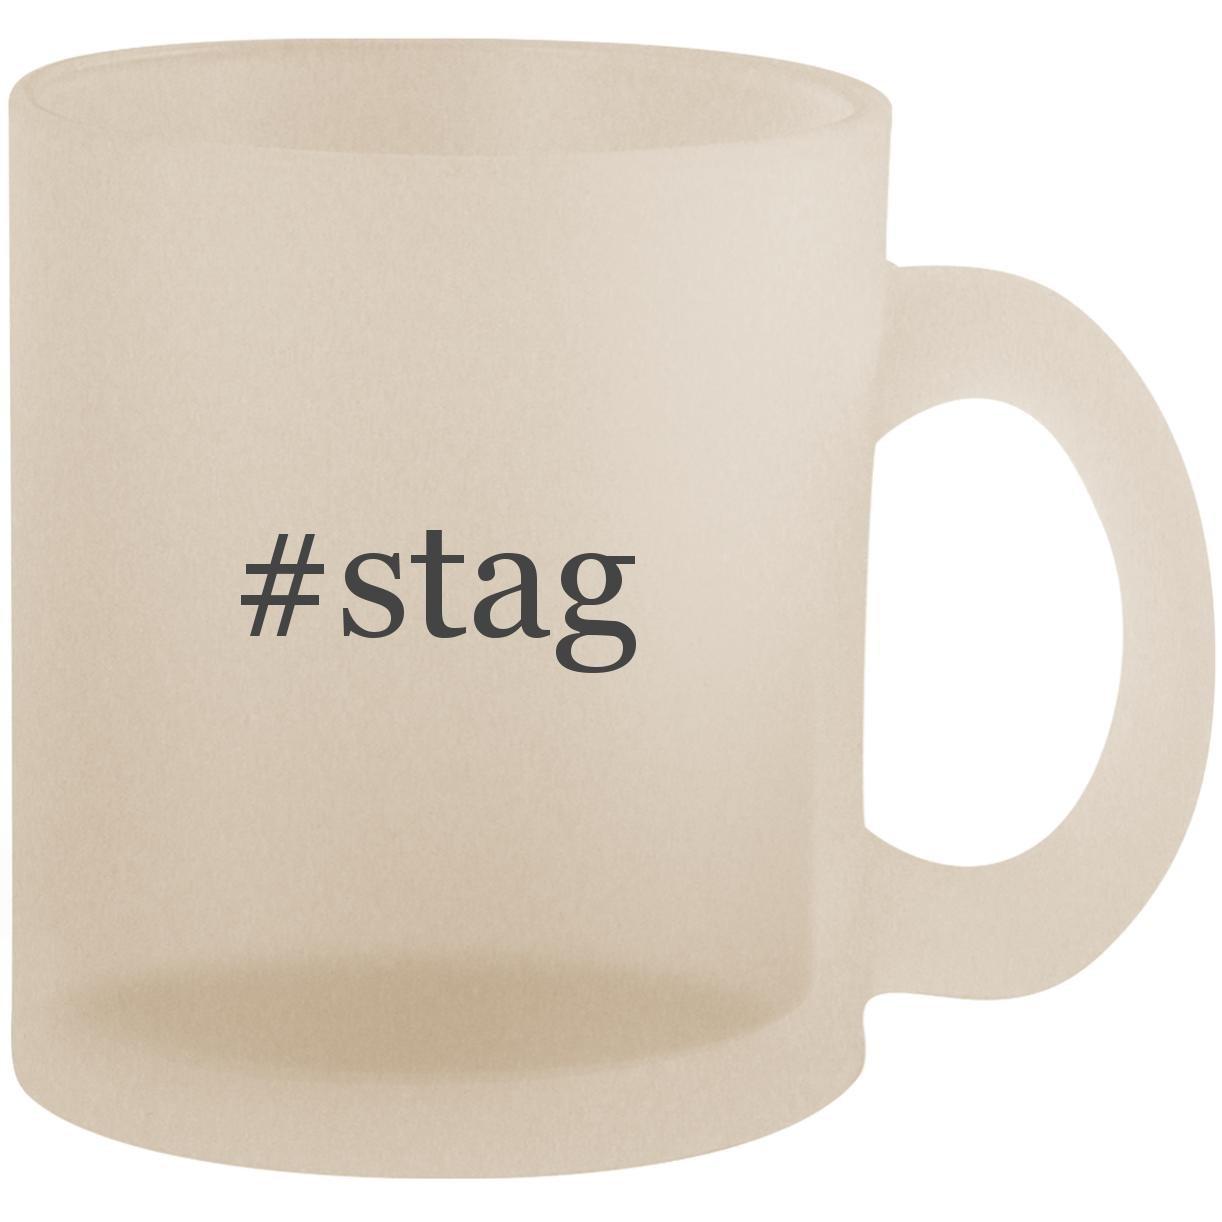 # Stag – ハッシュタグFrosted 10ozガラスコーヒーカップマグ B0742RB1ML